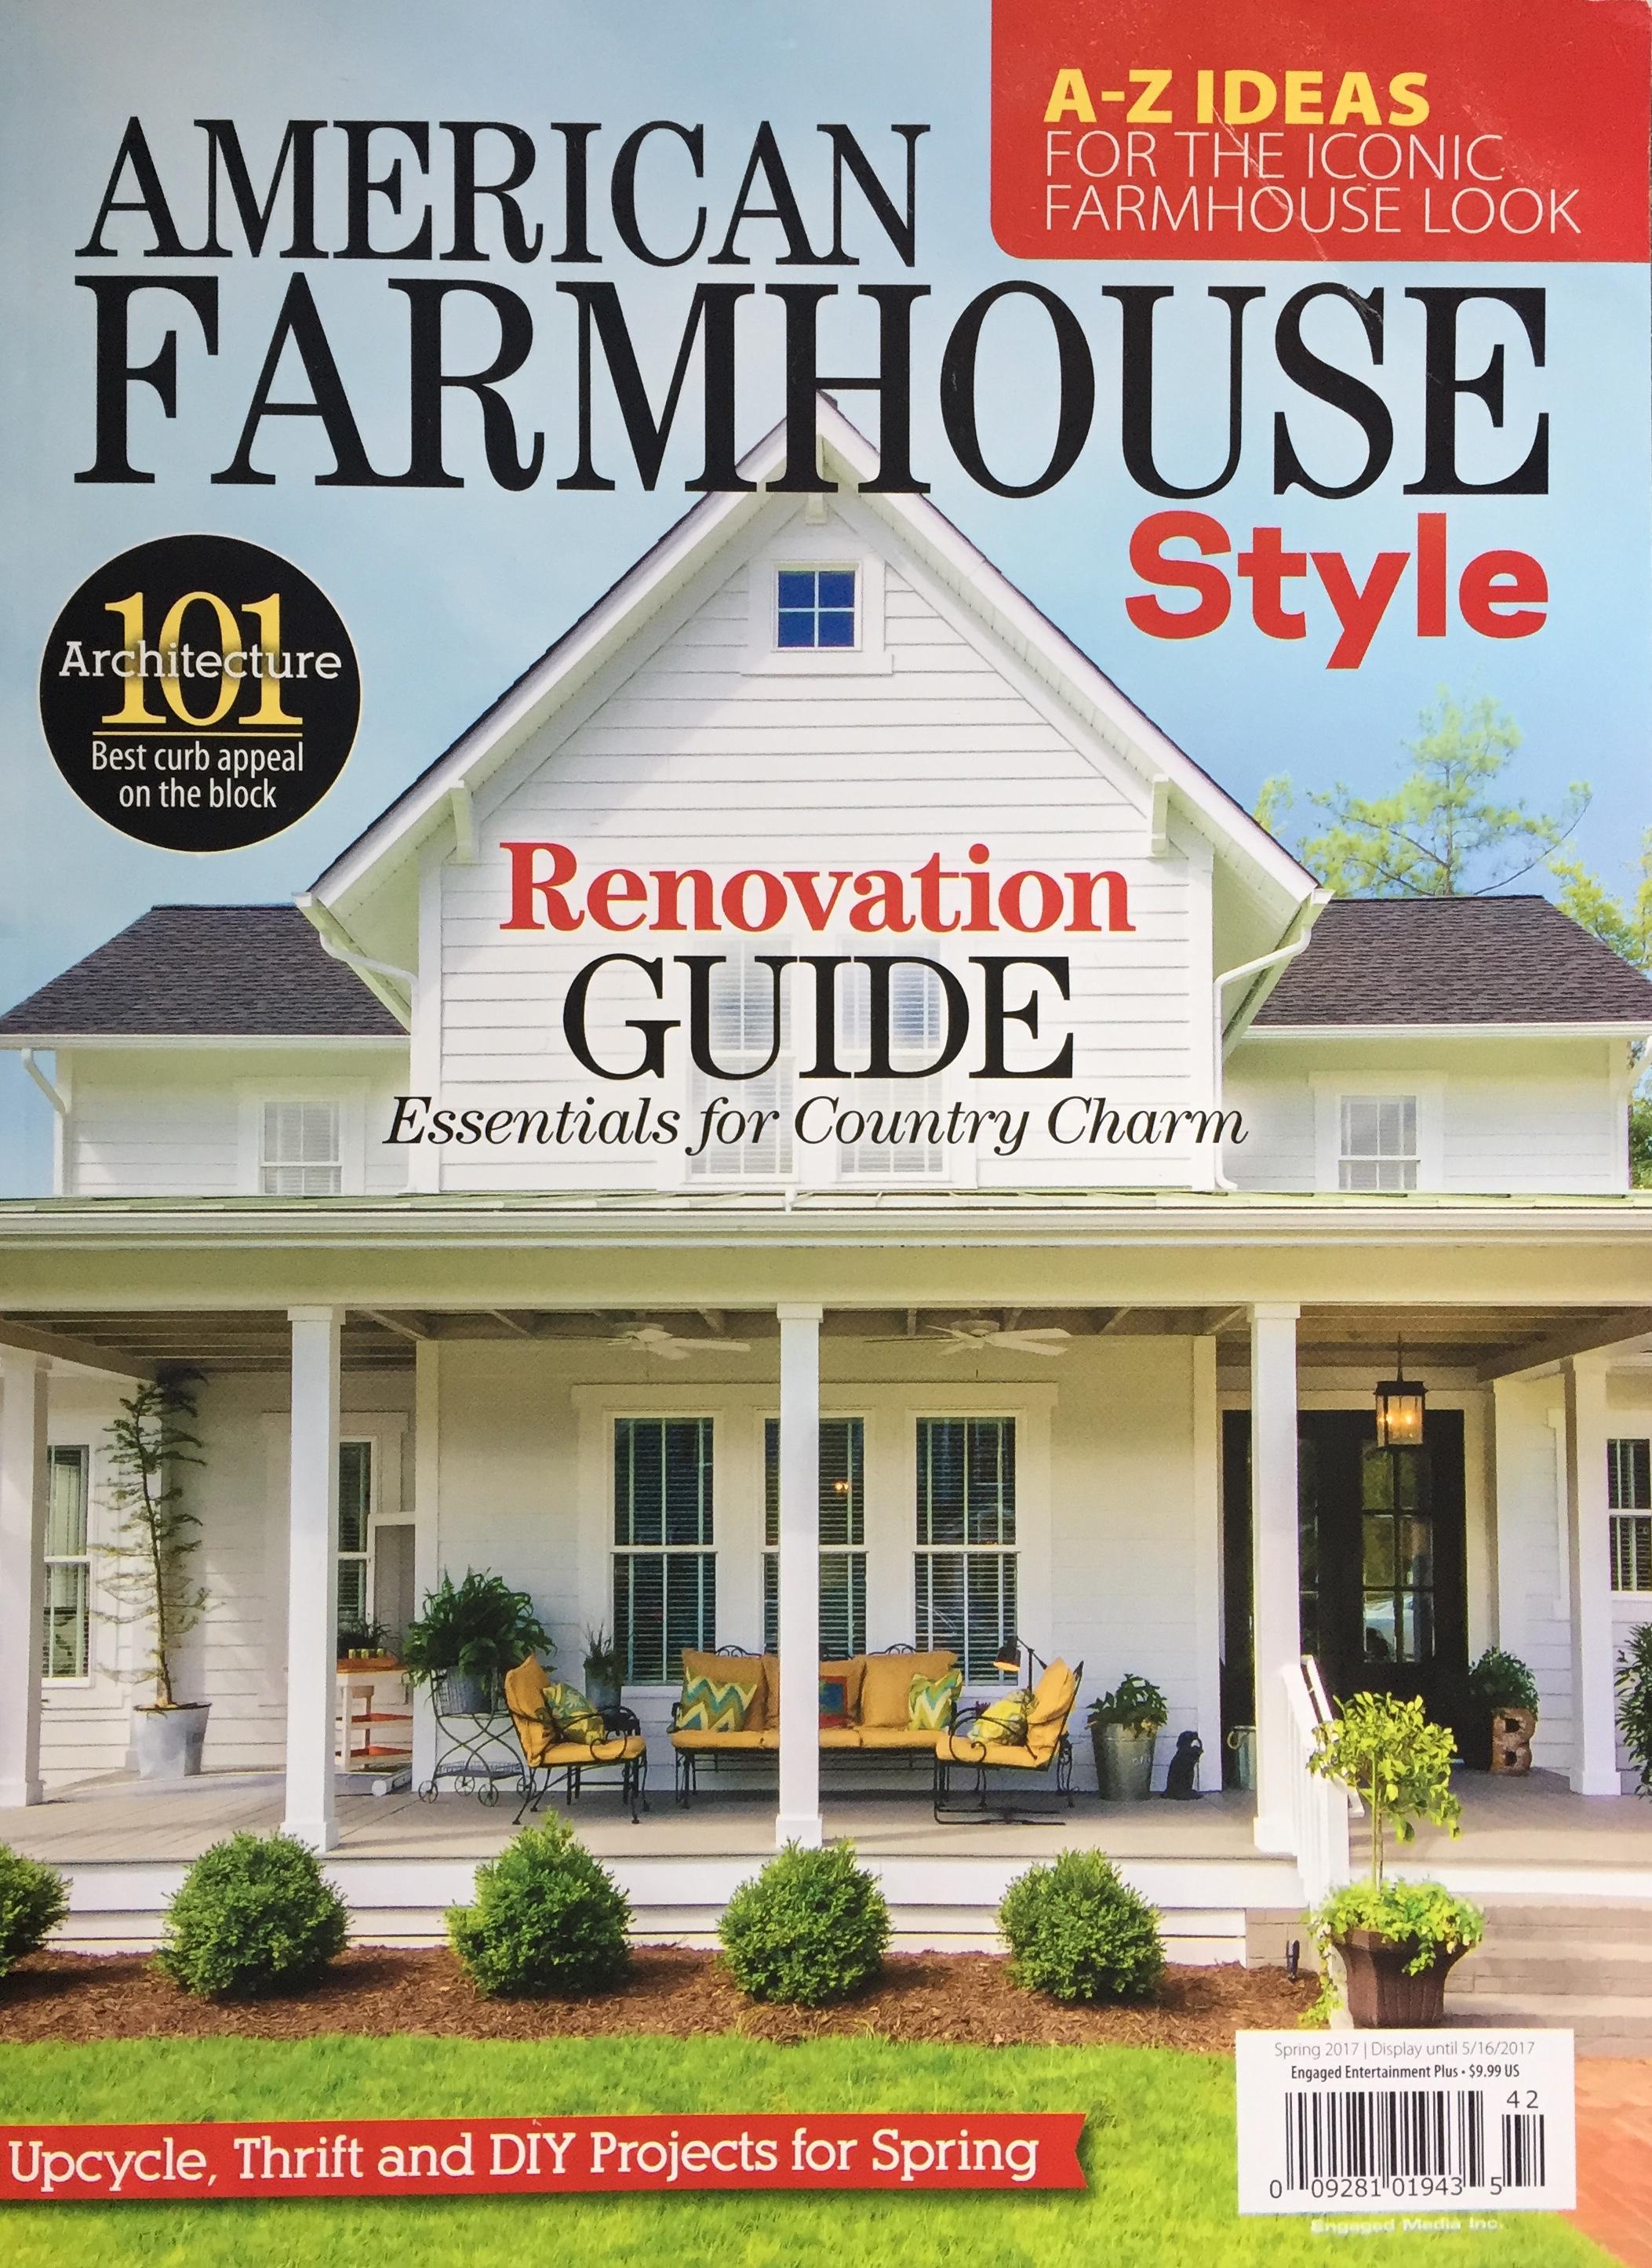 100 home design essentials room view living room sofa bed